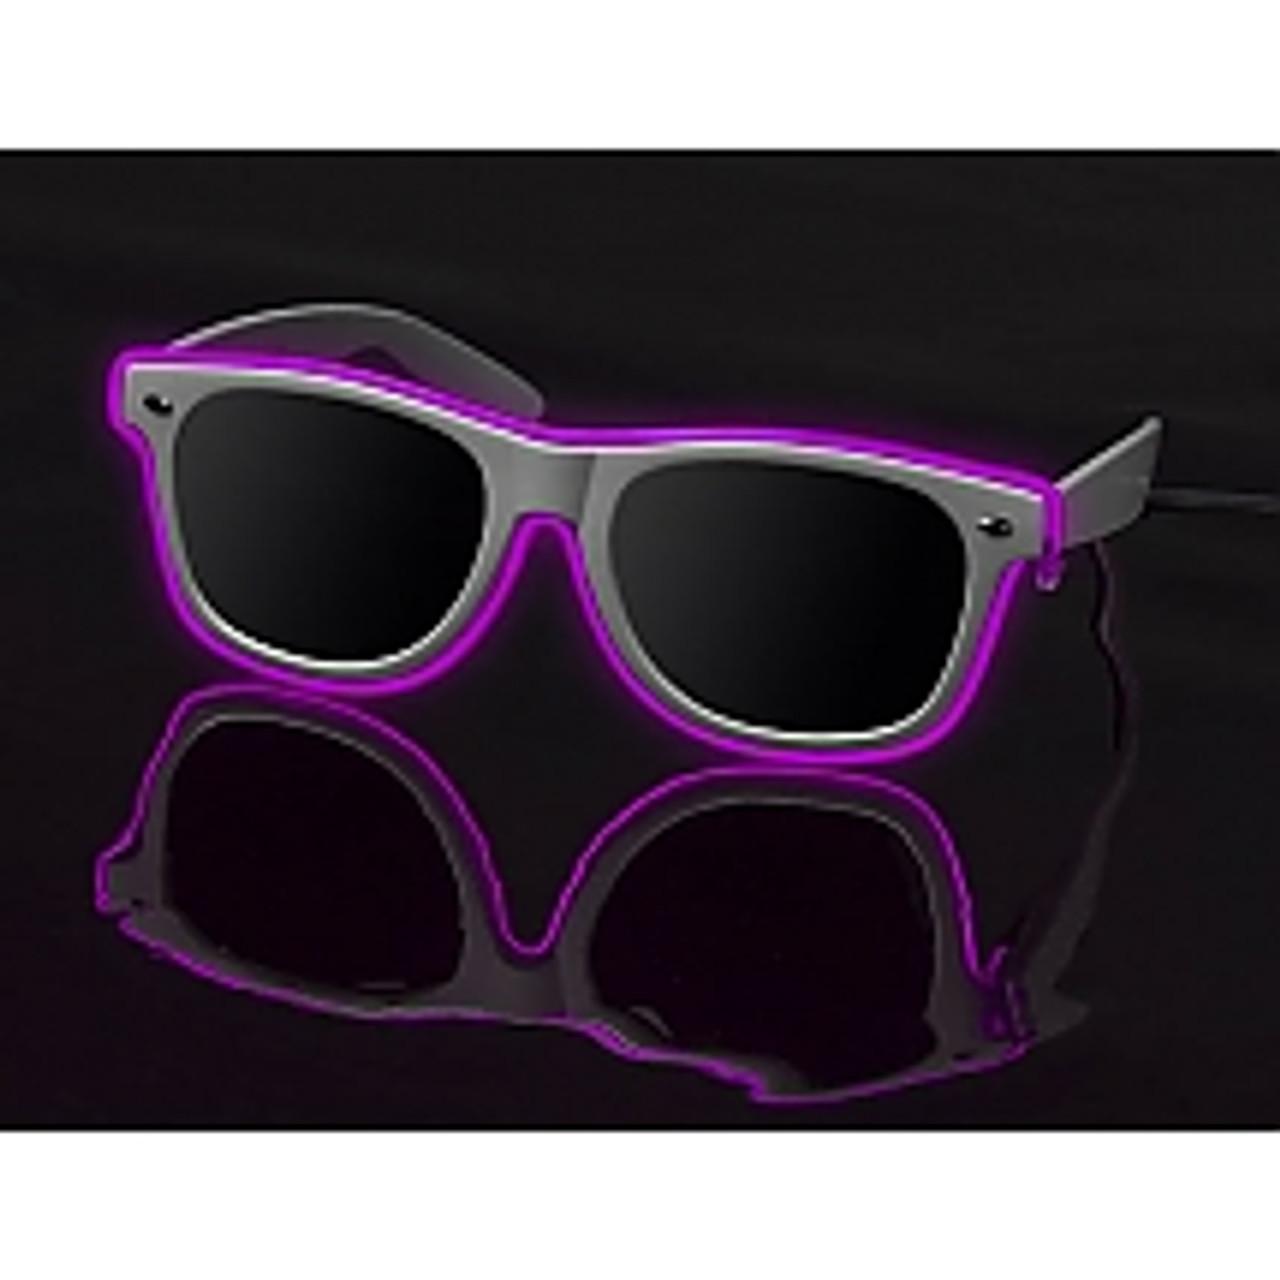 Light up Glasses, LED Glasses, Glow Glasses, Powered Glasses, Electro Glasses, SunGlasses, Sun Glasses, Sun, Glasses, El Wire Glasses, Wayfare lenses, customizable, lenses, Glow Lens, Glow, Lenses, LED, Nightclub, PartyRock, Party, Rock